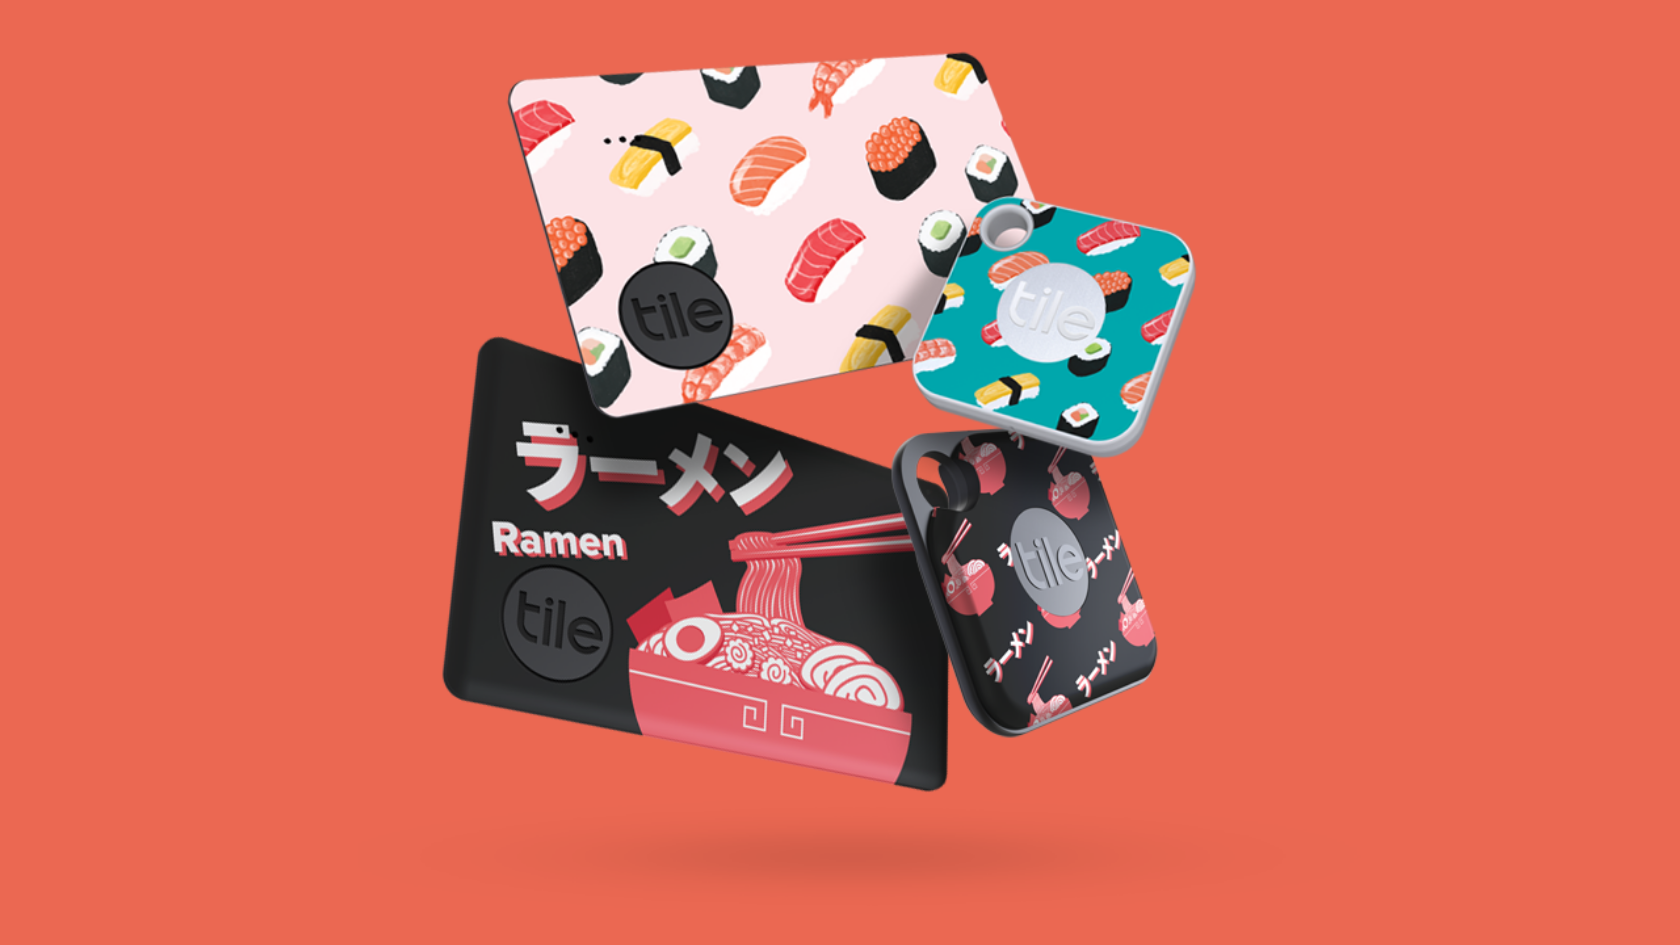 Holiday Tech Gifts 2020 | Oiishi and Slurp | Tile